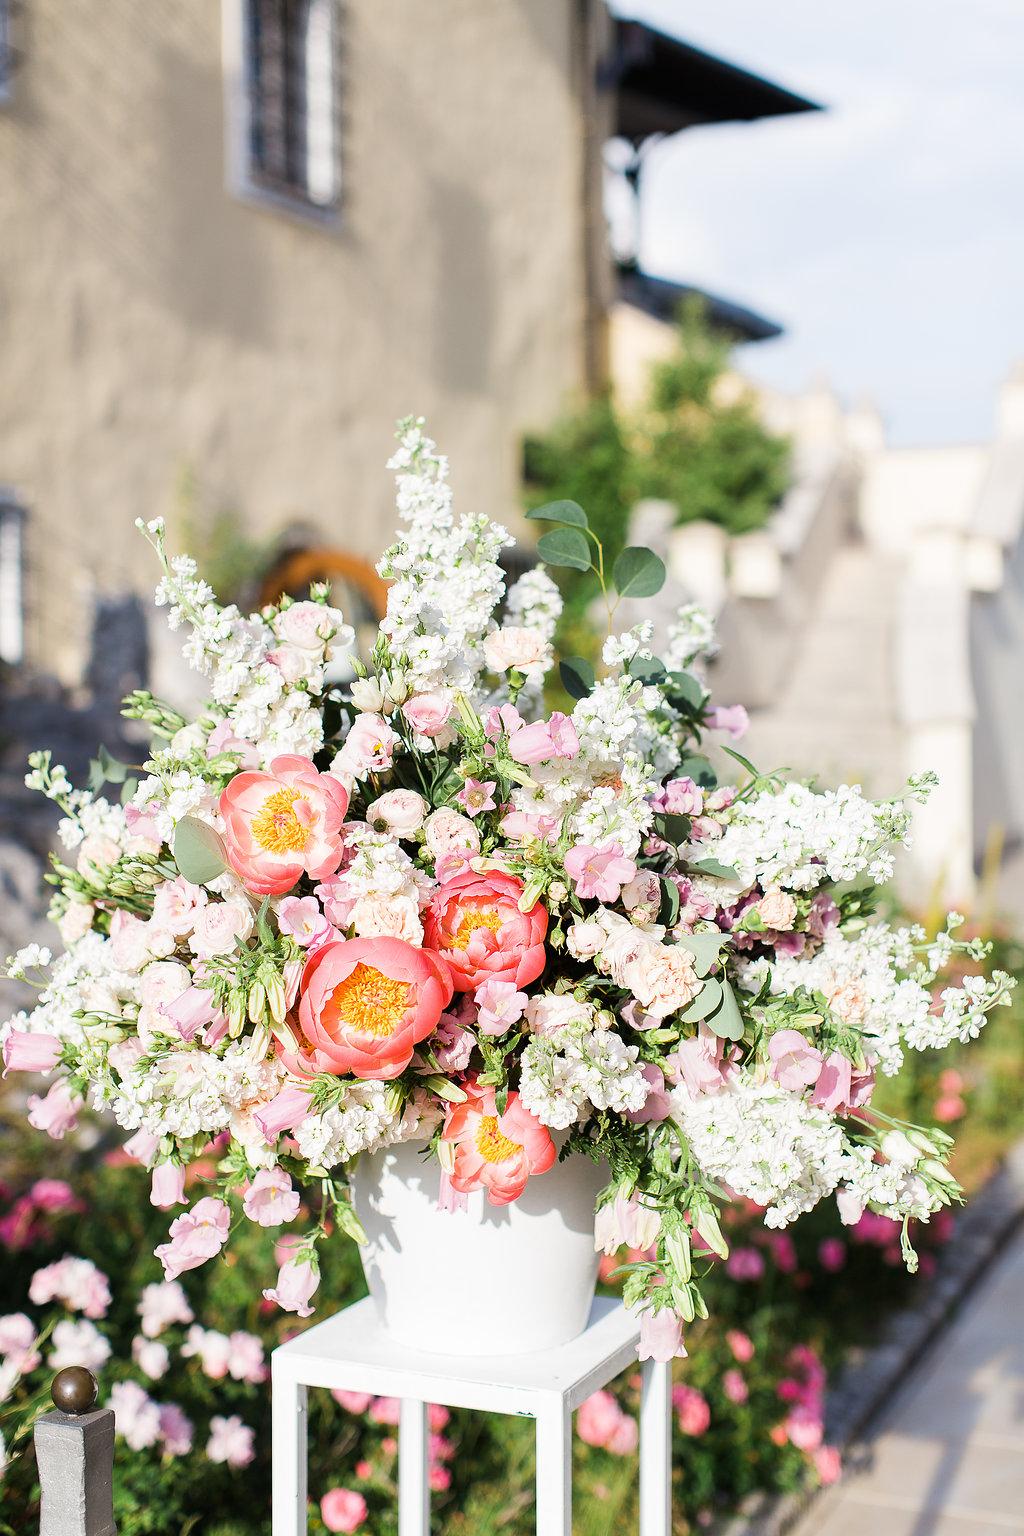 Luxe Navy and Pink Wedding at Schloss Fuschl in Austria by Tanja Kibogo25.JPG